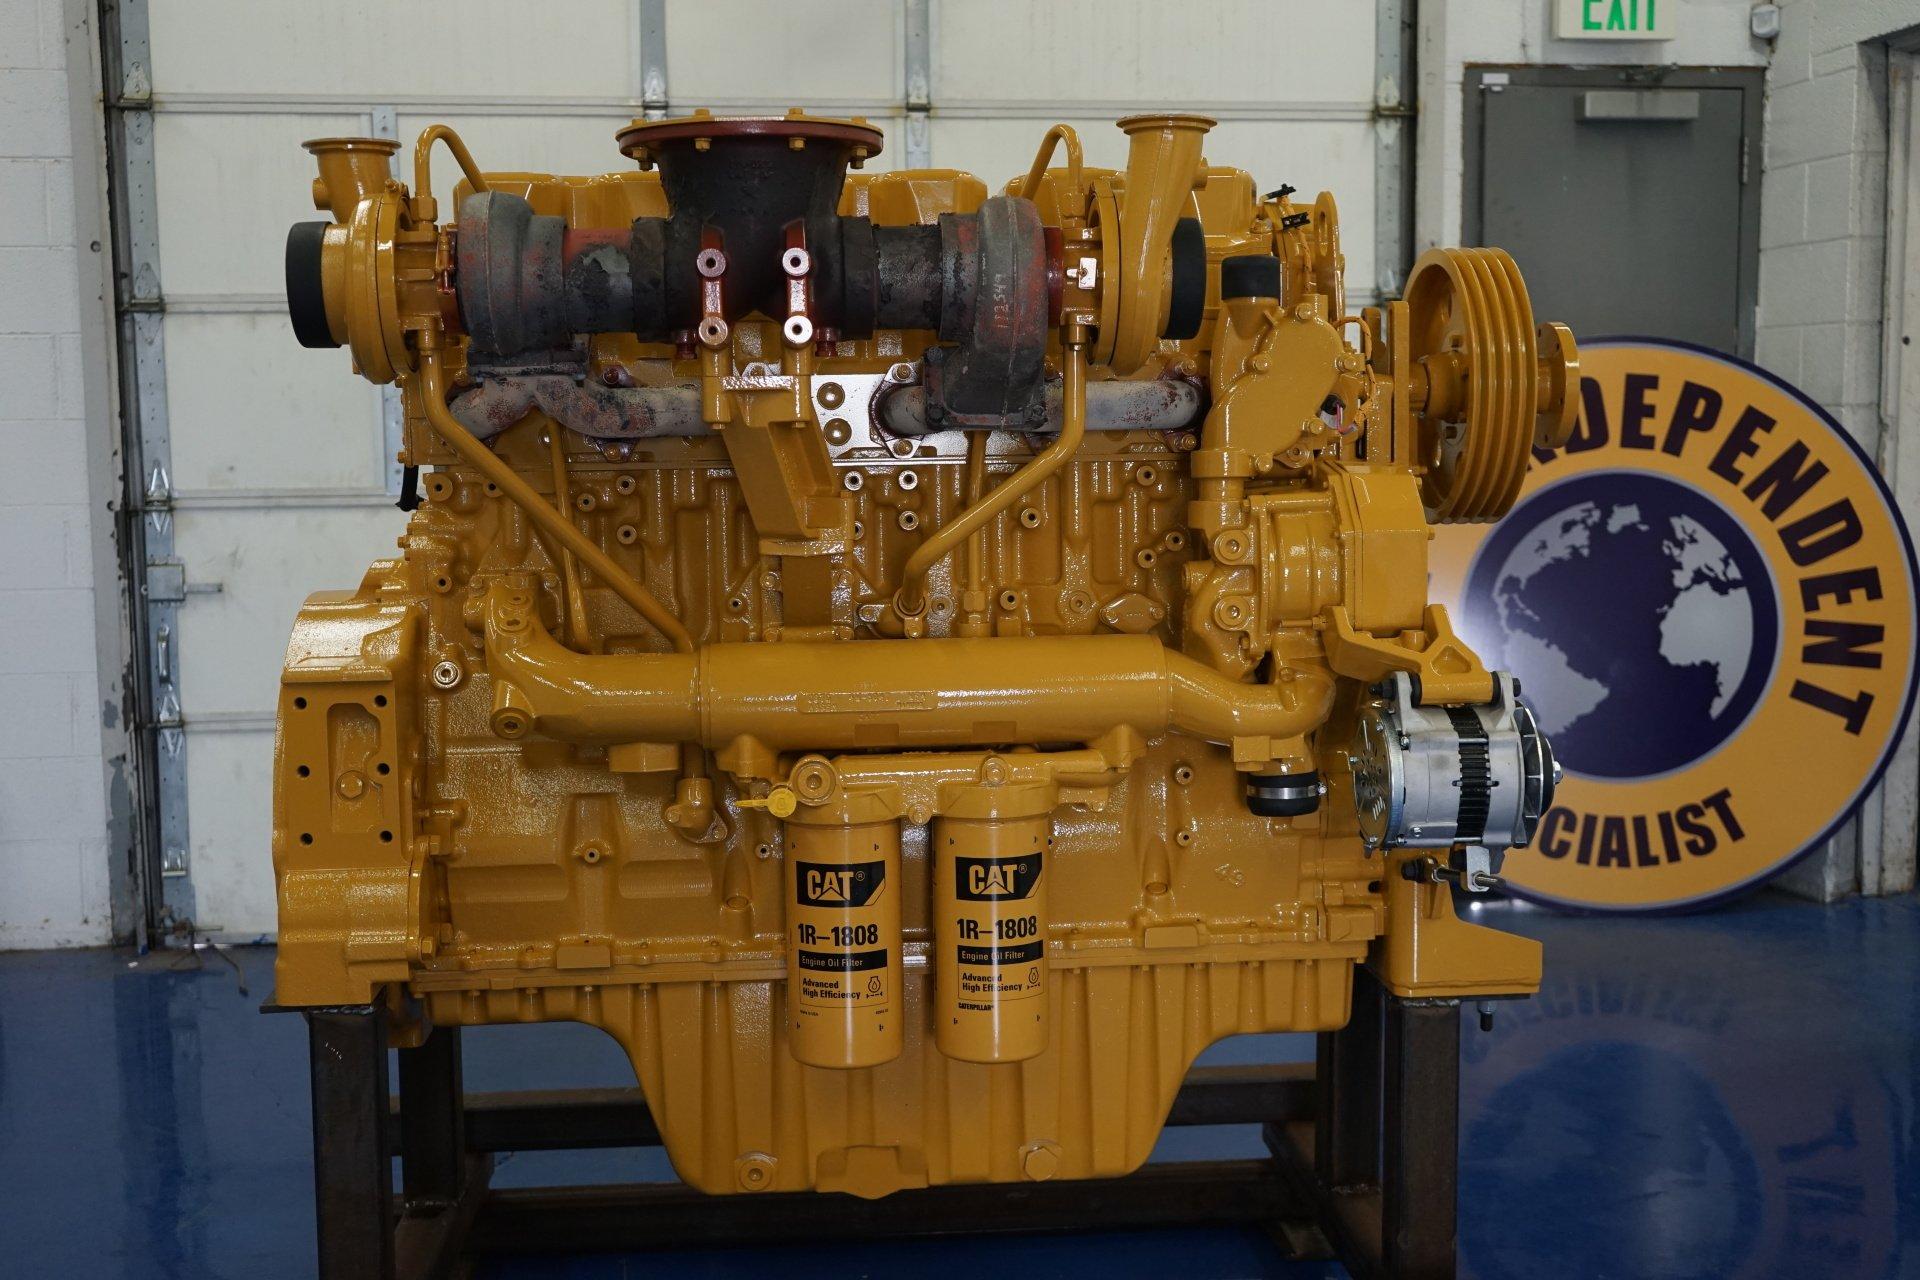 Cat Engines For Sale New And Rebuilt Caterpillar Motors 3516 Wiring Diagrams C18